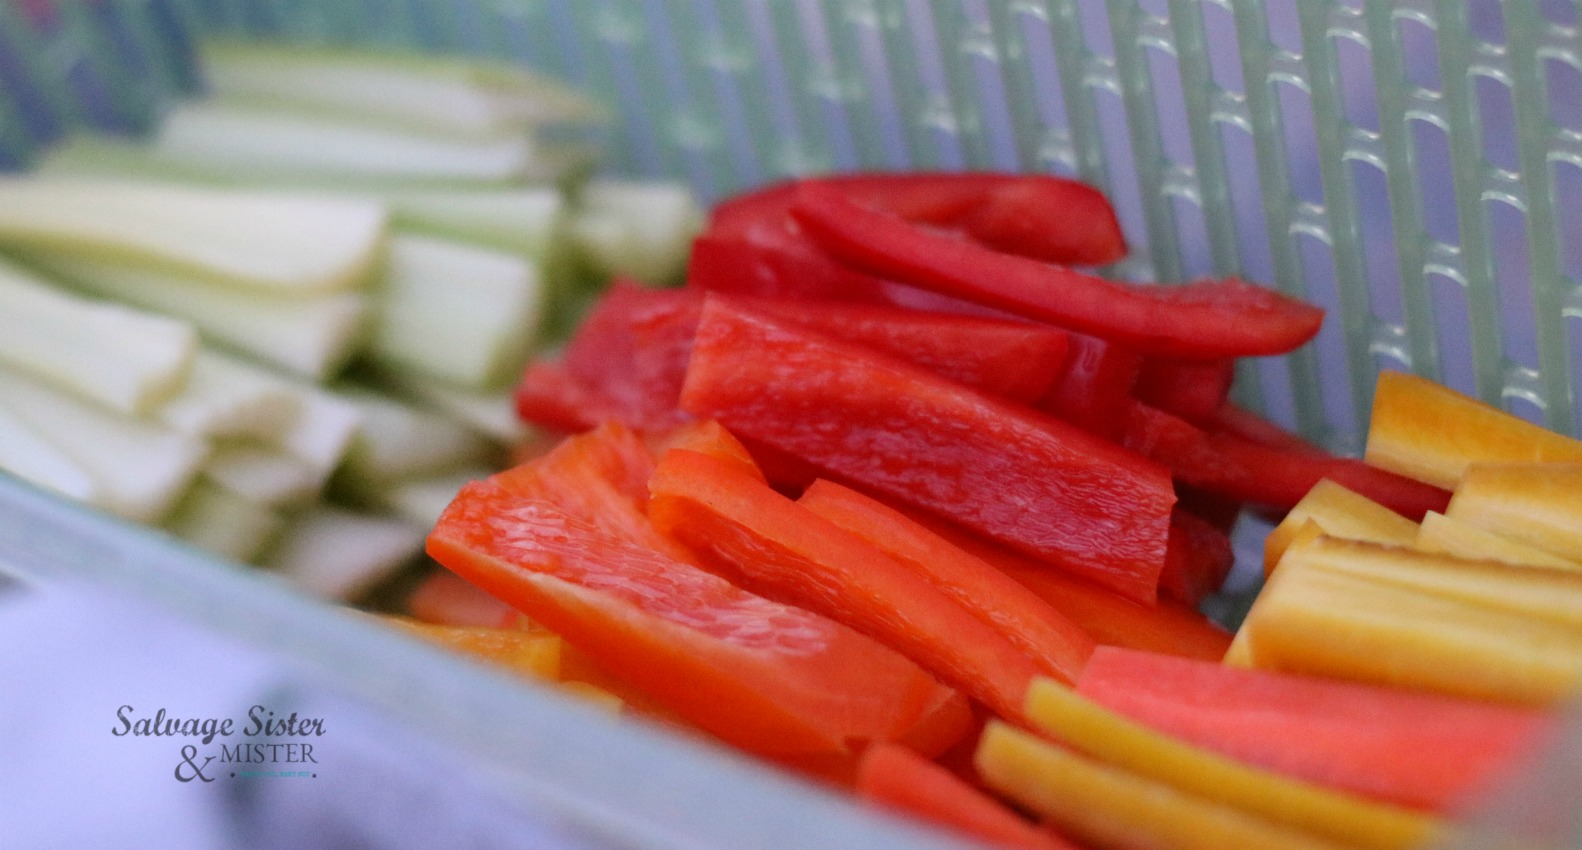 preparing veggies for the week on salvagesisterandmister.com